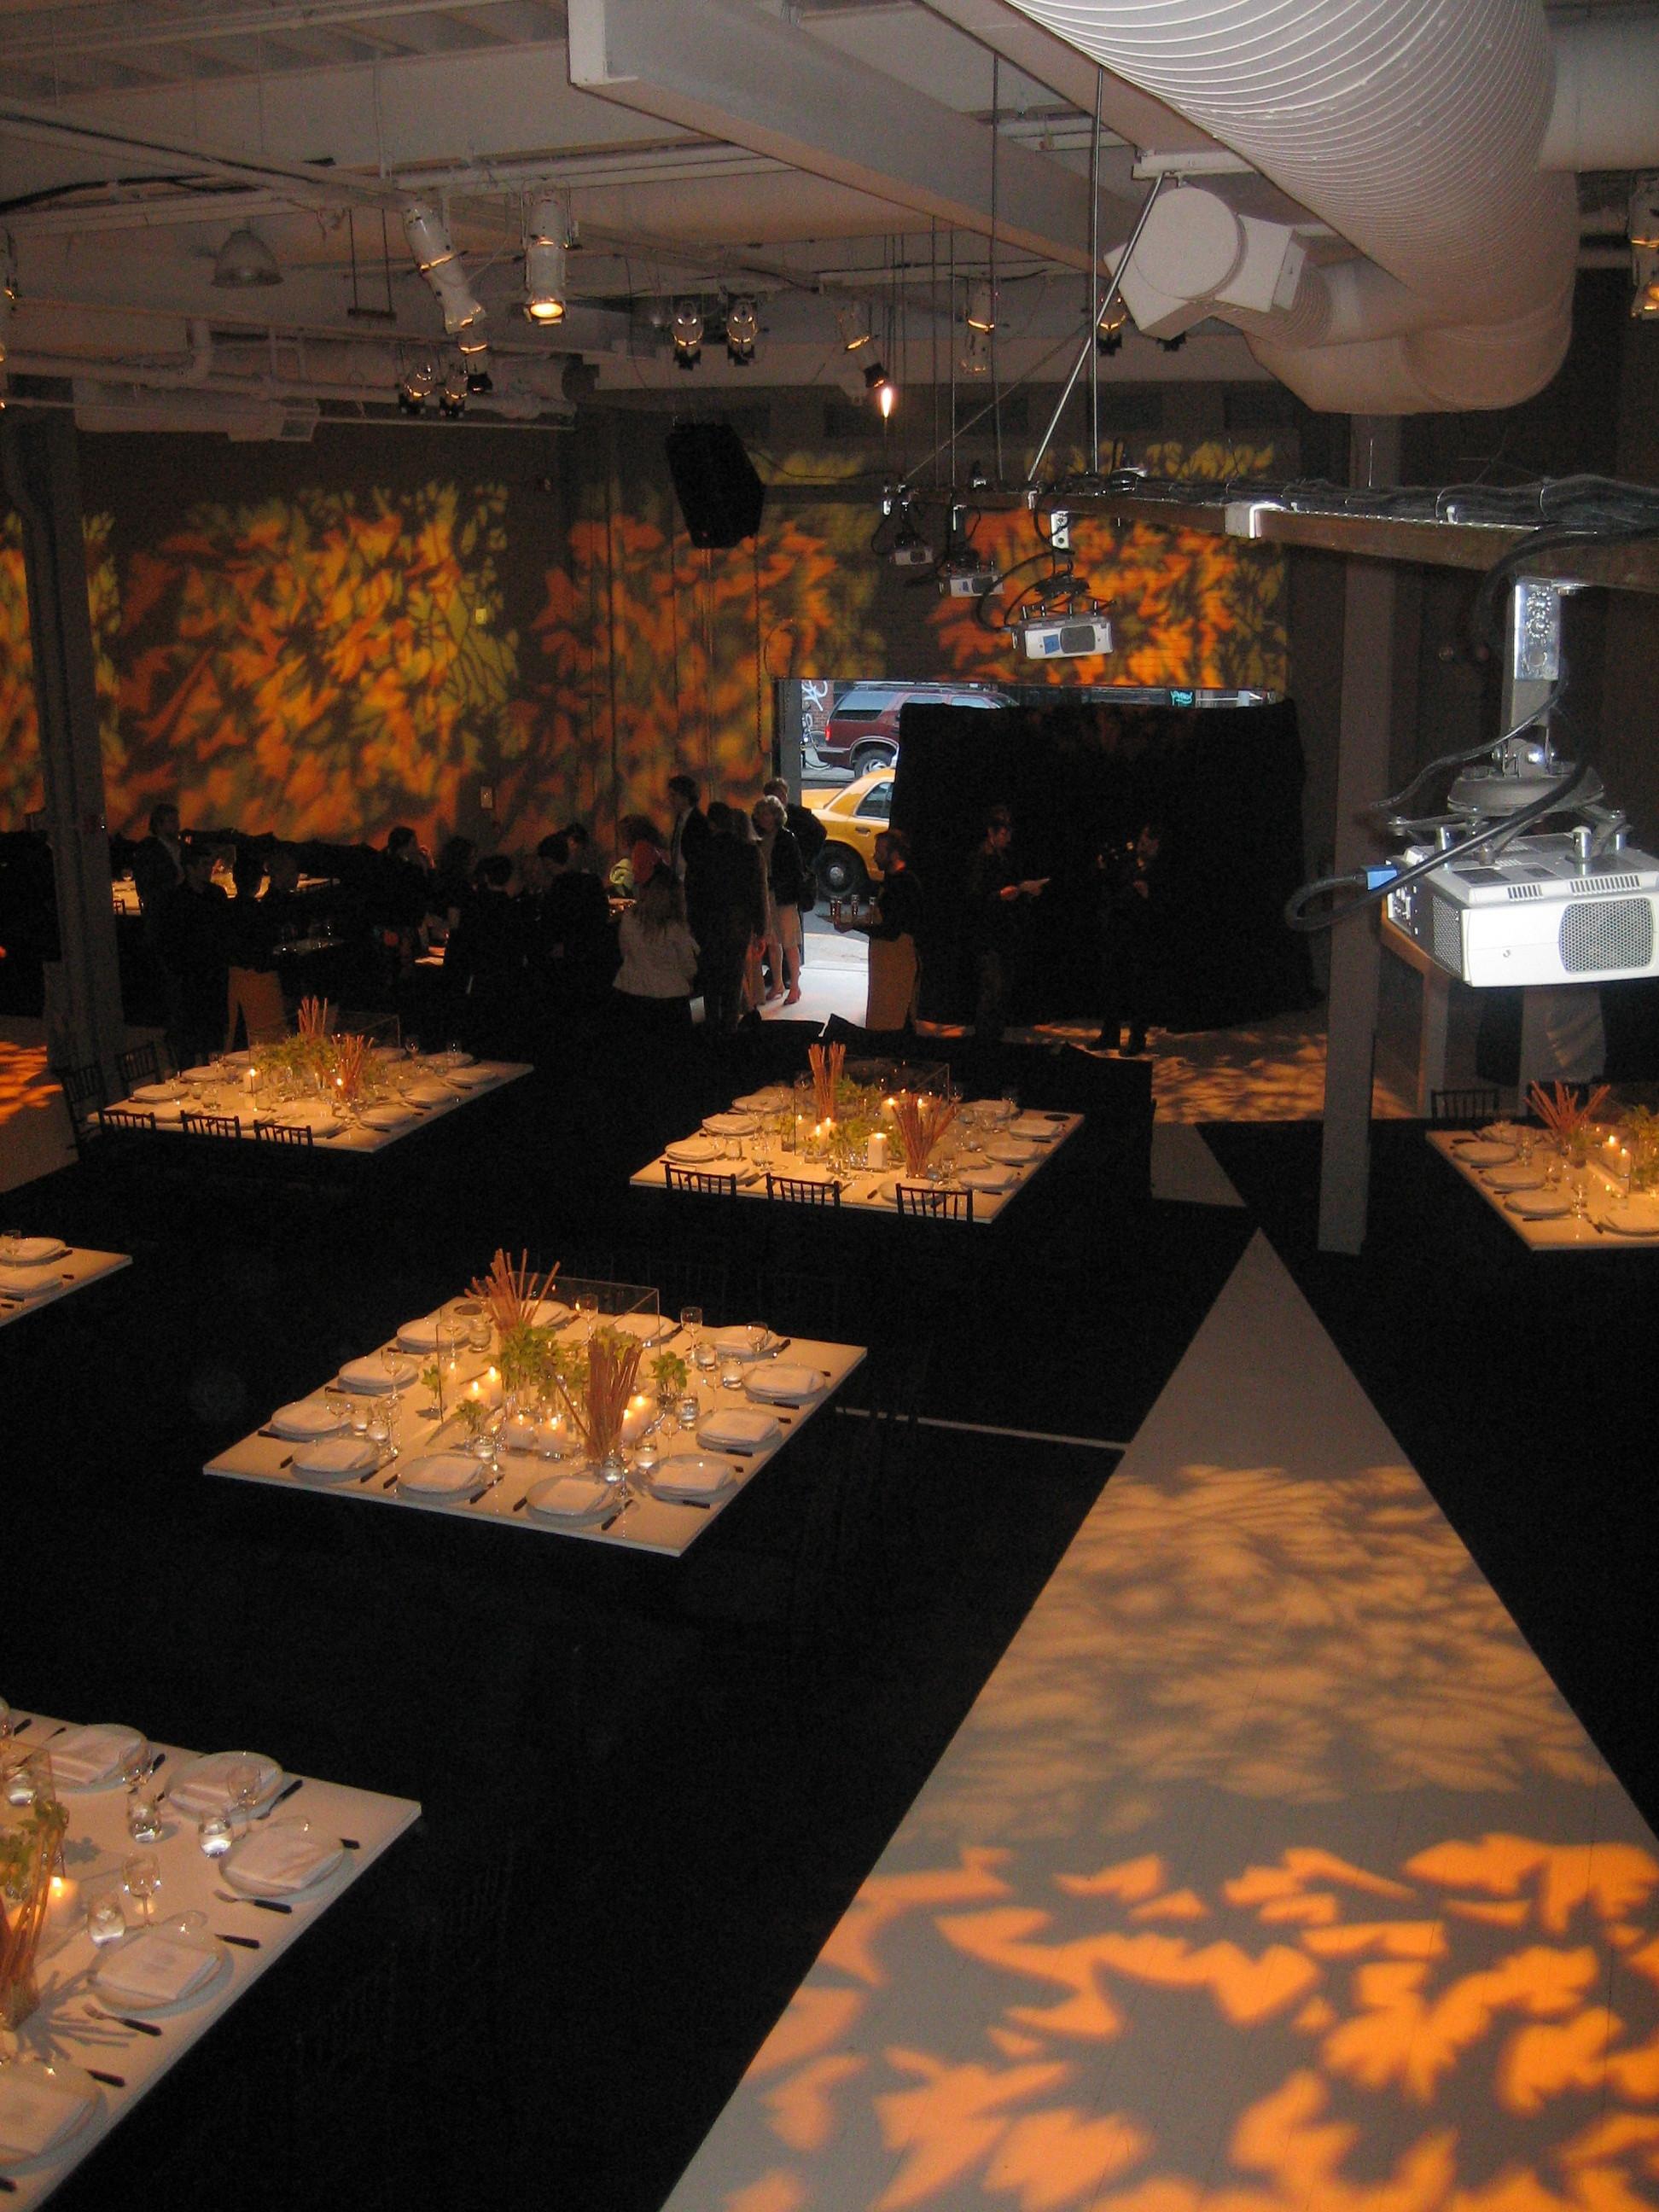 Lighting Display for Event